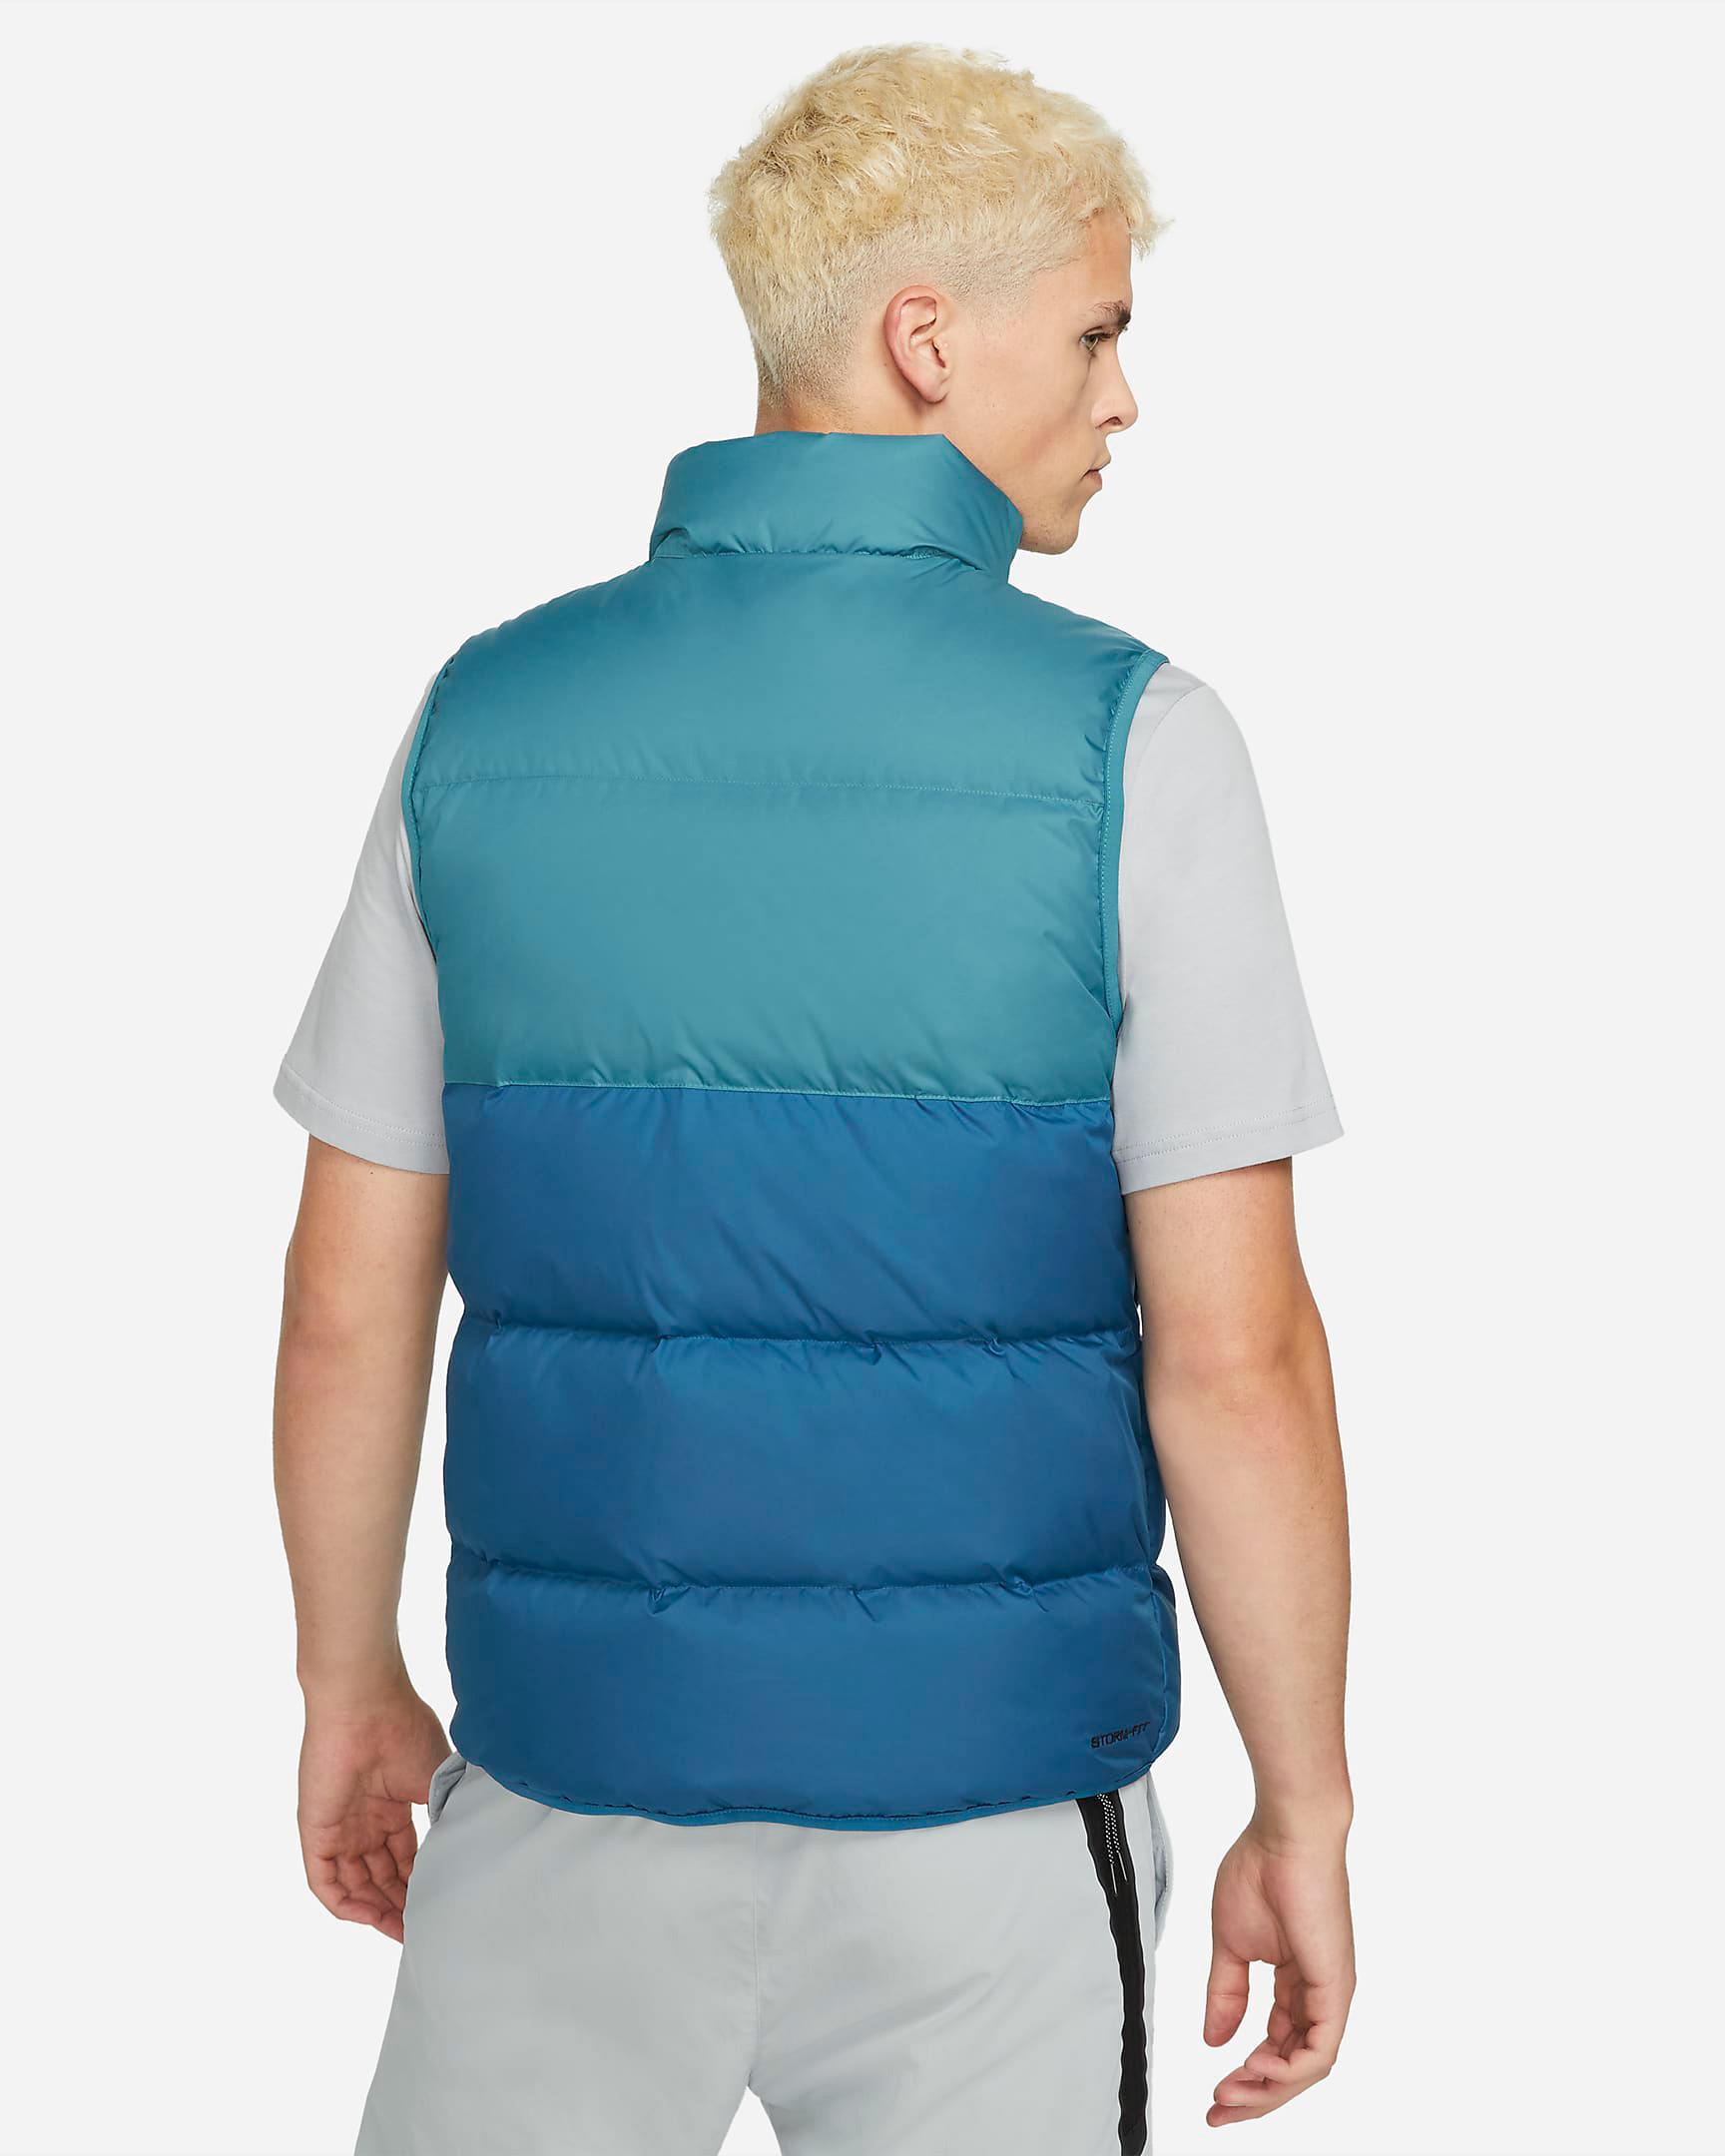 nike-sportswear-storm-fit-windrunner-vest-jacket-rift-blue-court-blue-sail-2